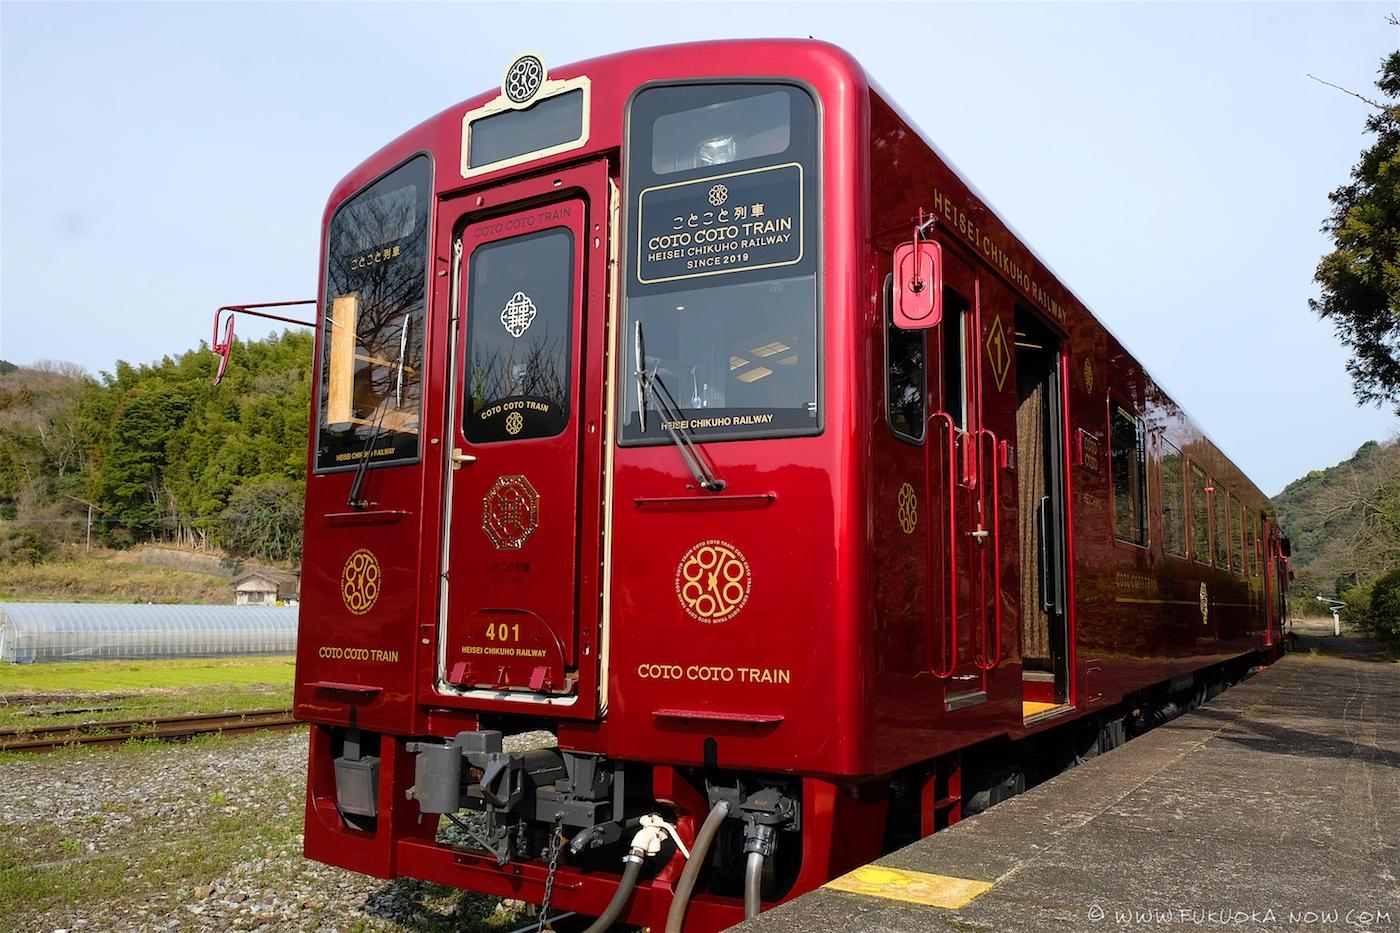 coto coto train, kyushu, sightseeing train, japan